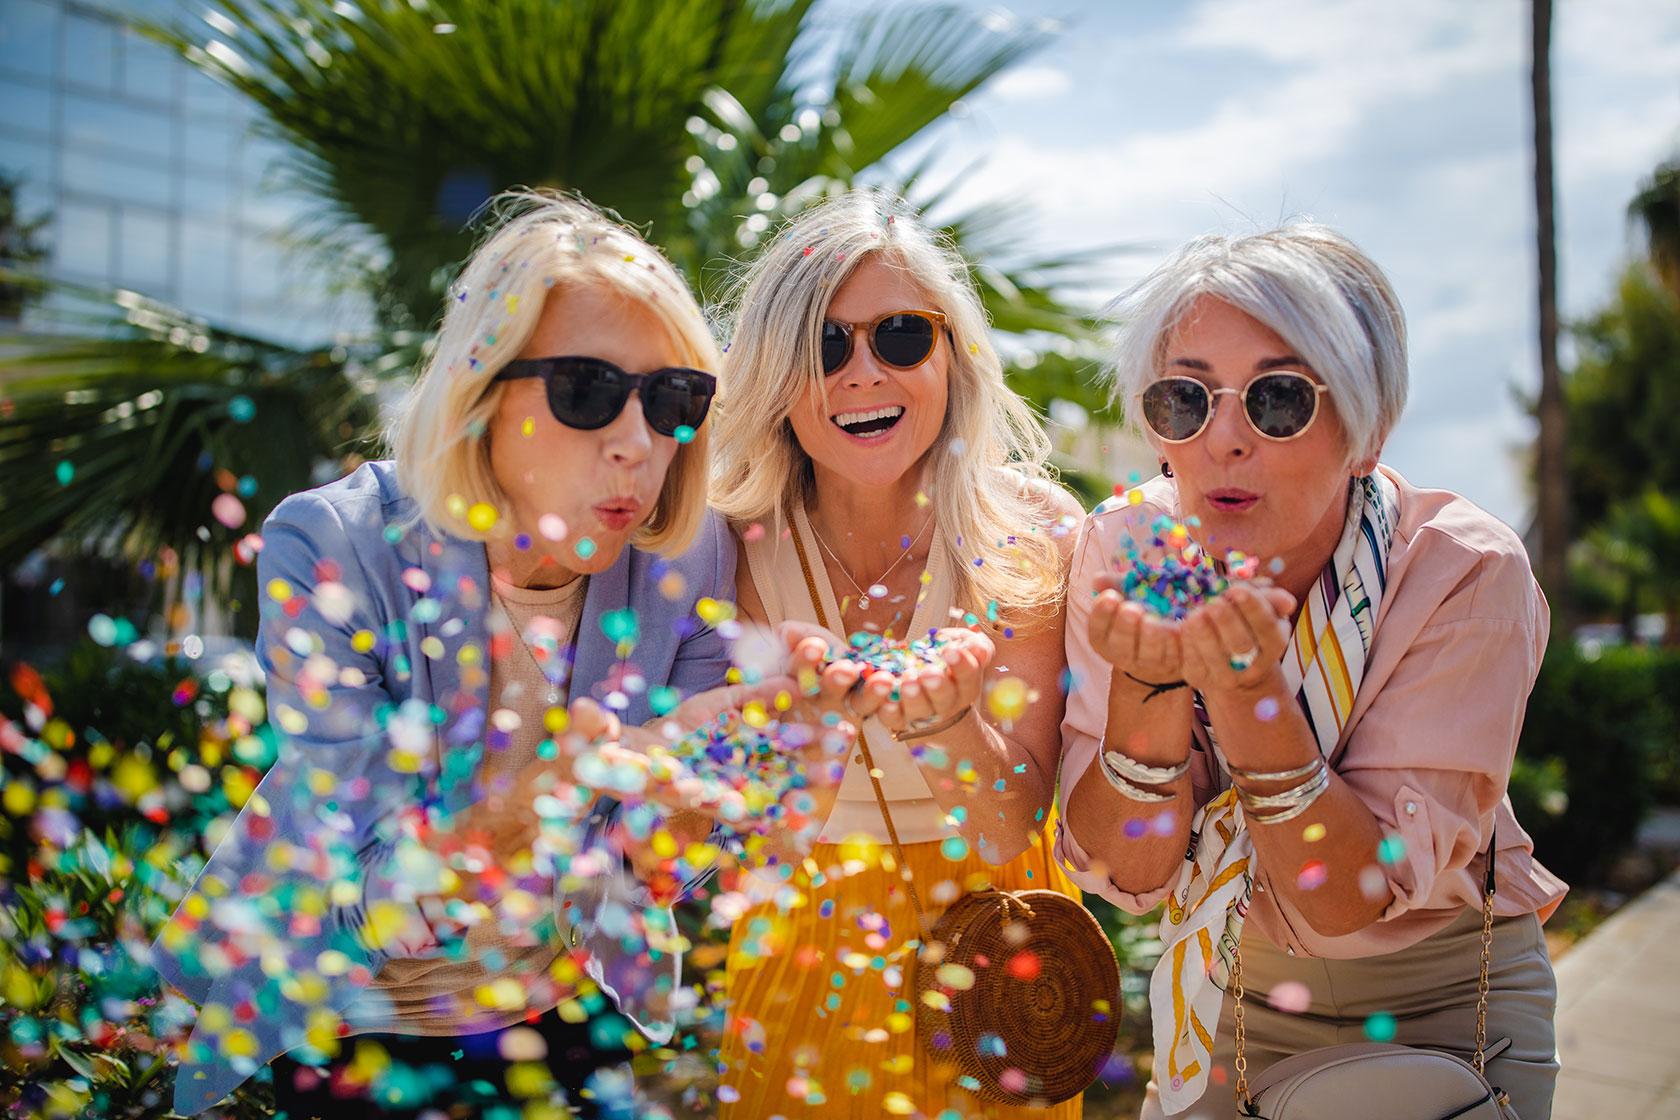 Three older women in sunglasses blowing confetti